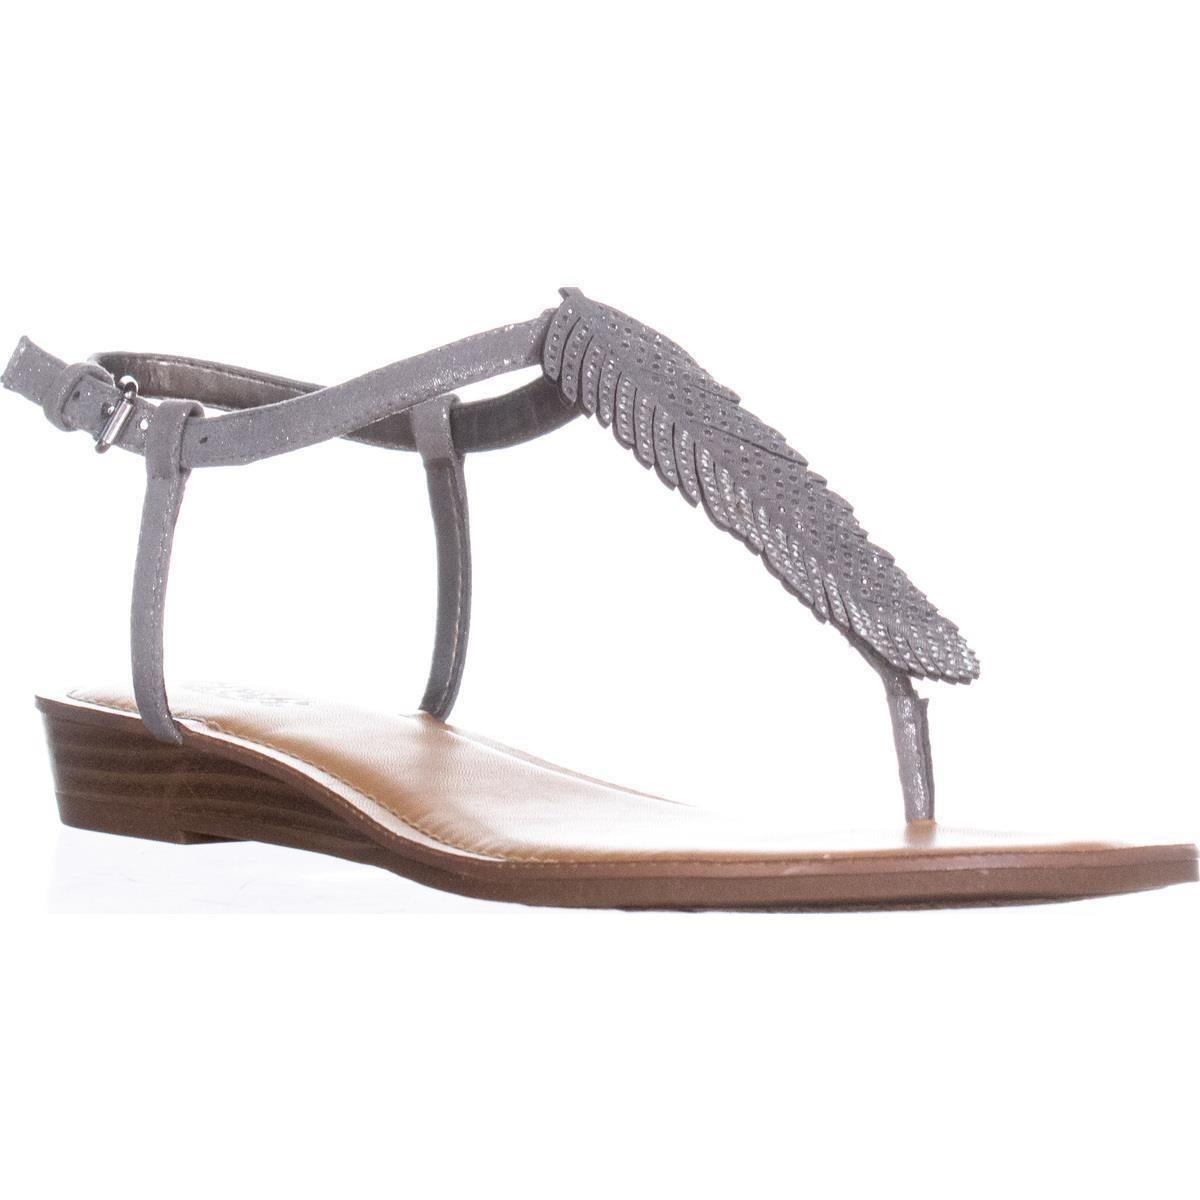 2b3ea5dbe8a5 Carlos By Carlos Santana Tenor Flat Thong Sandals - Save 10% - Lyst